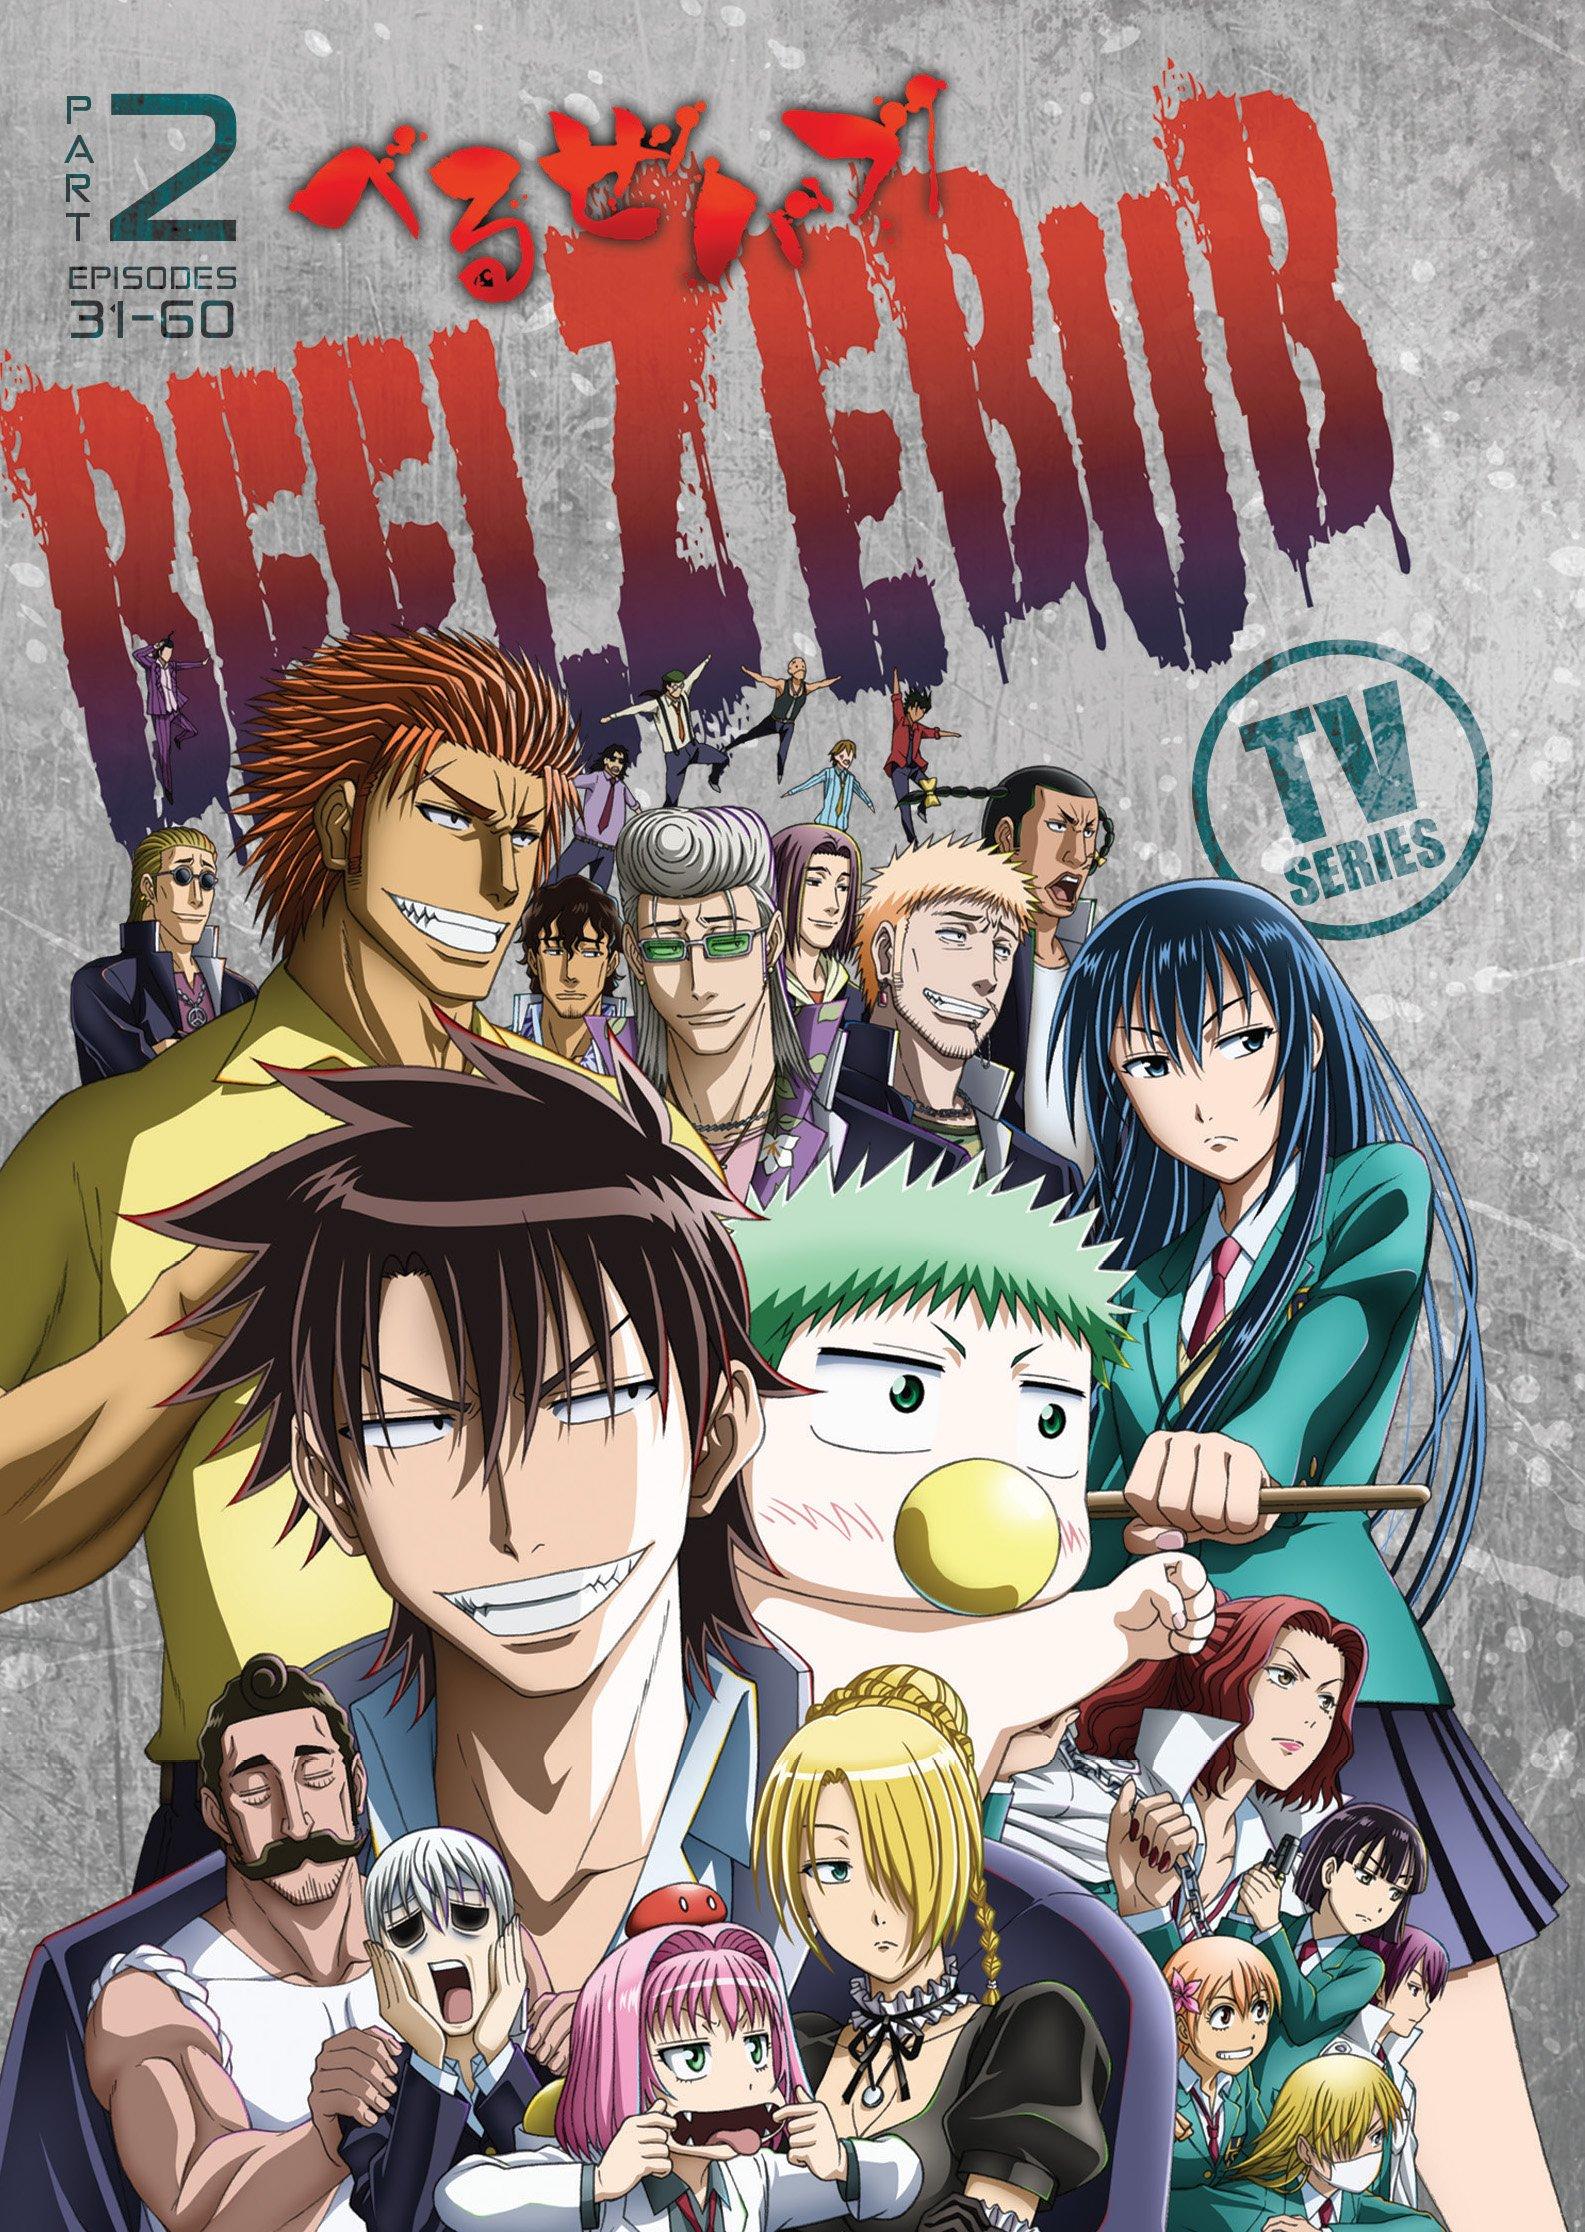 Beelzebub Tv Series Part 2